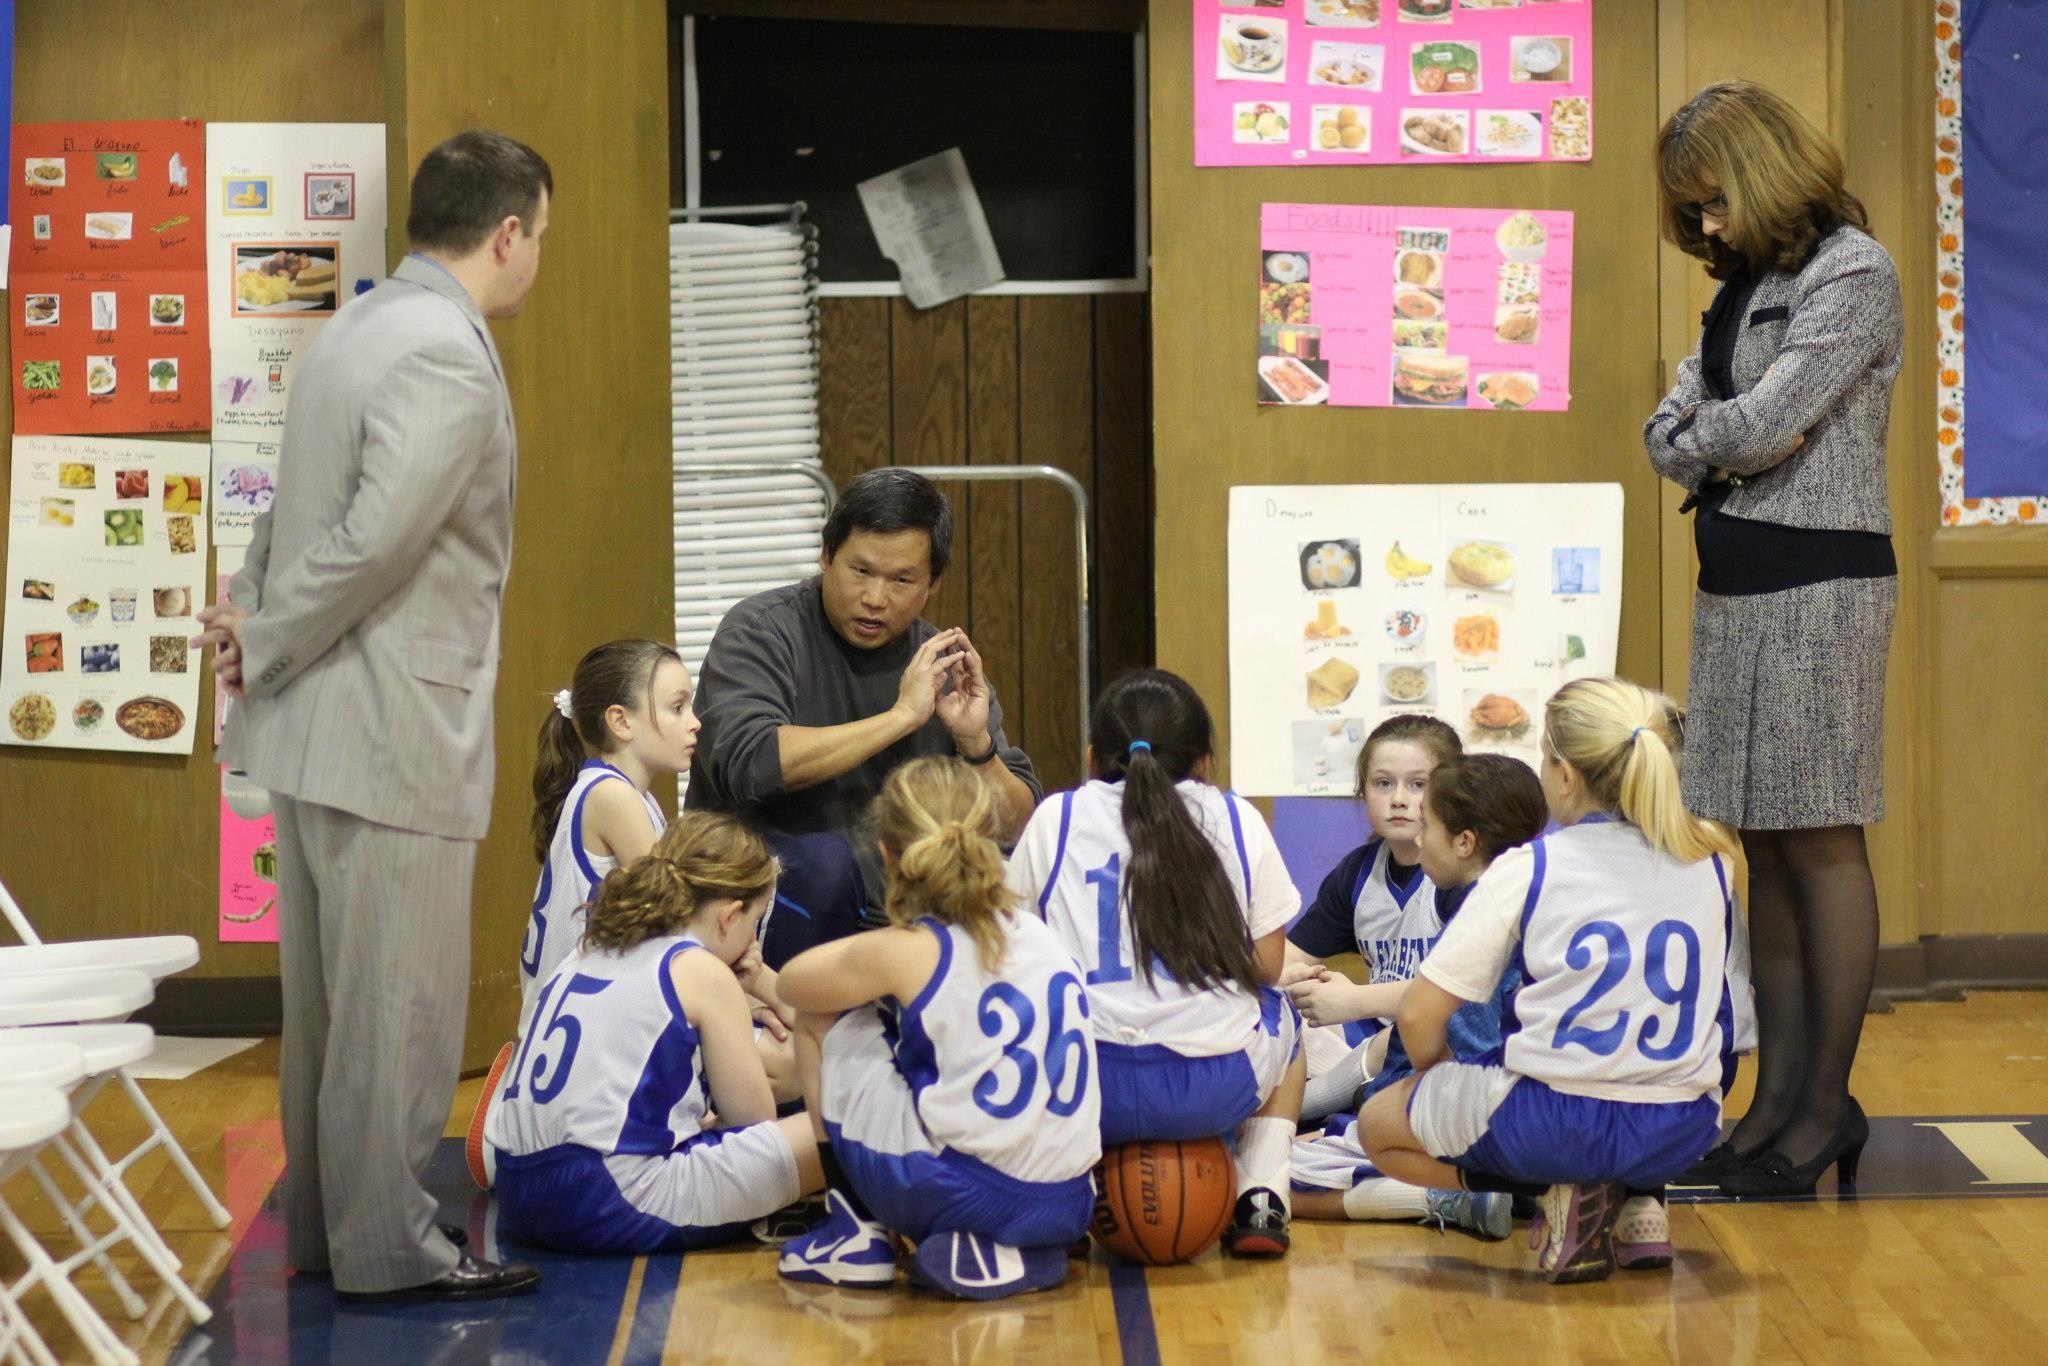 Coaching wills blog coach as a role model xflitez Images